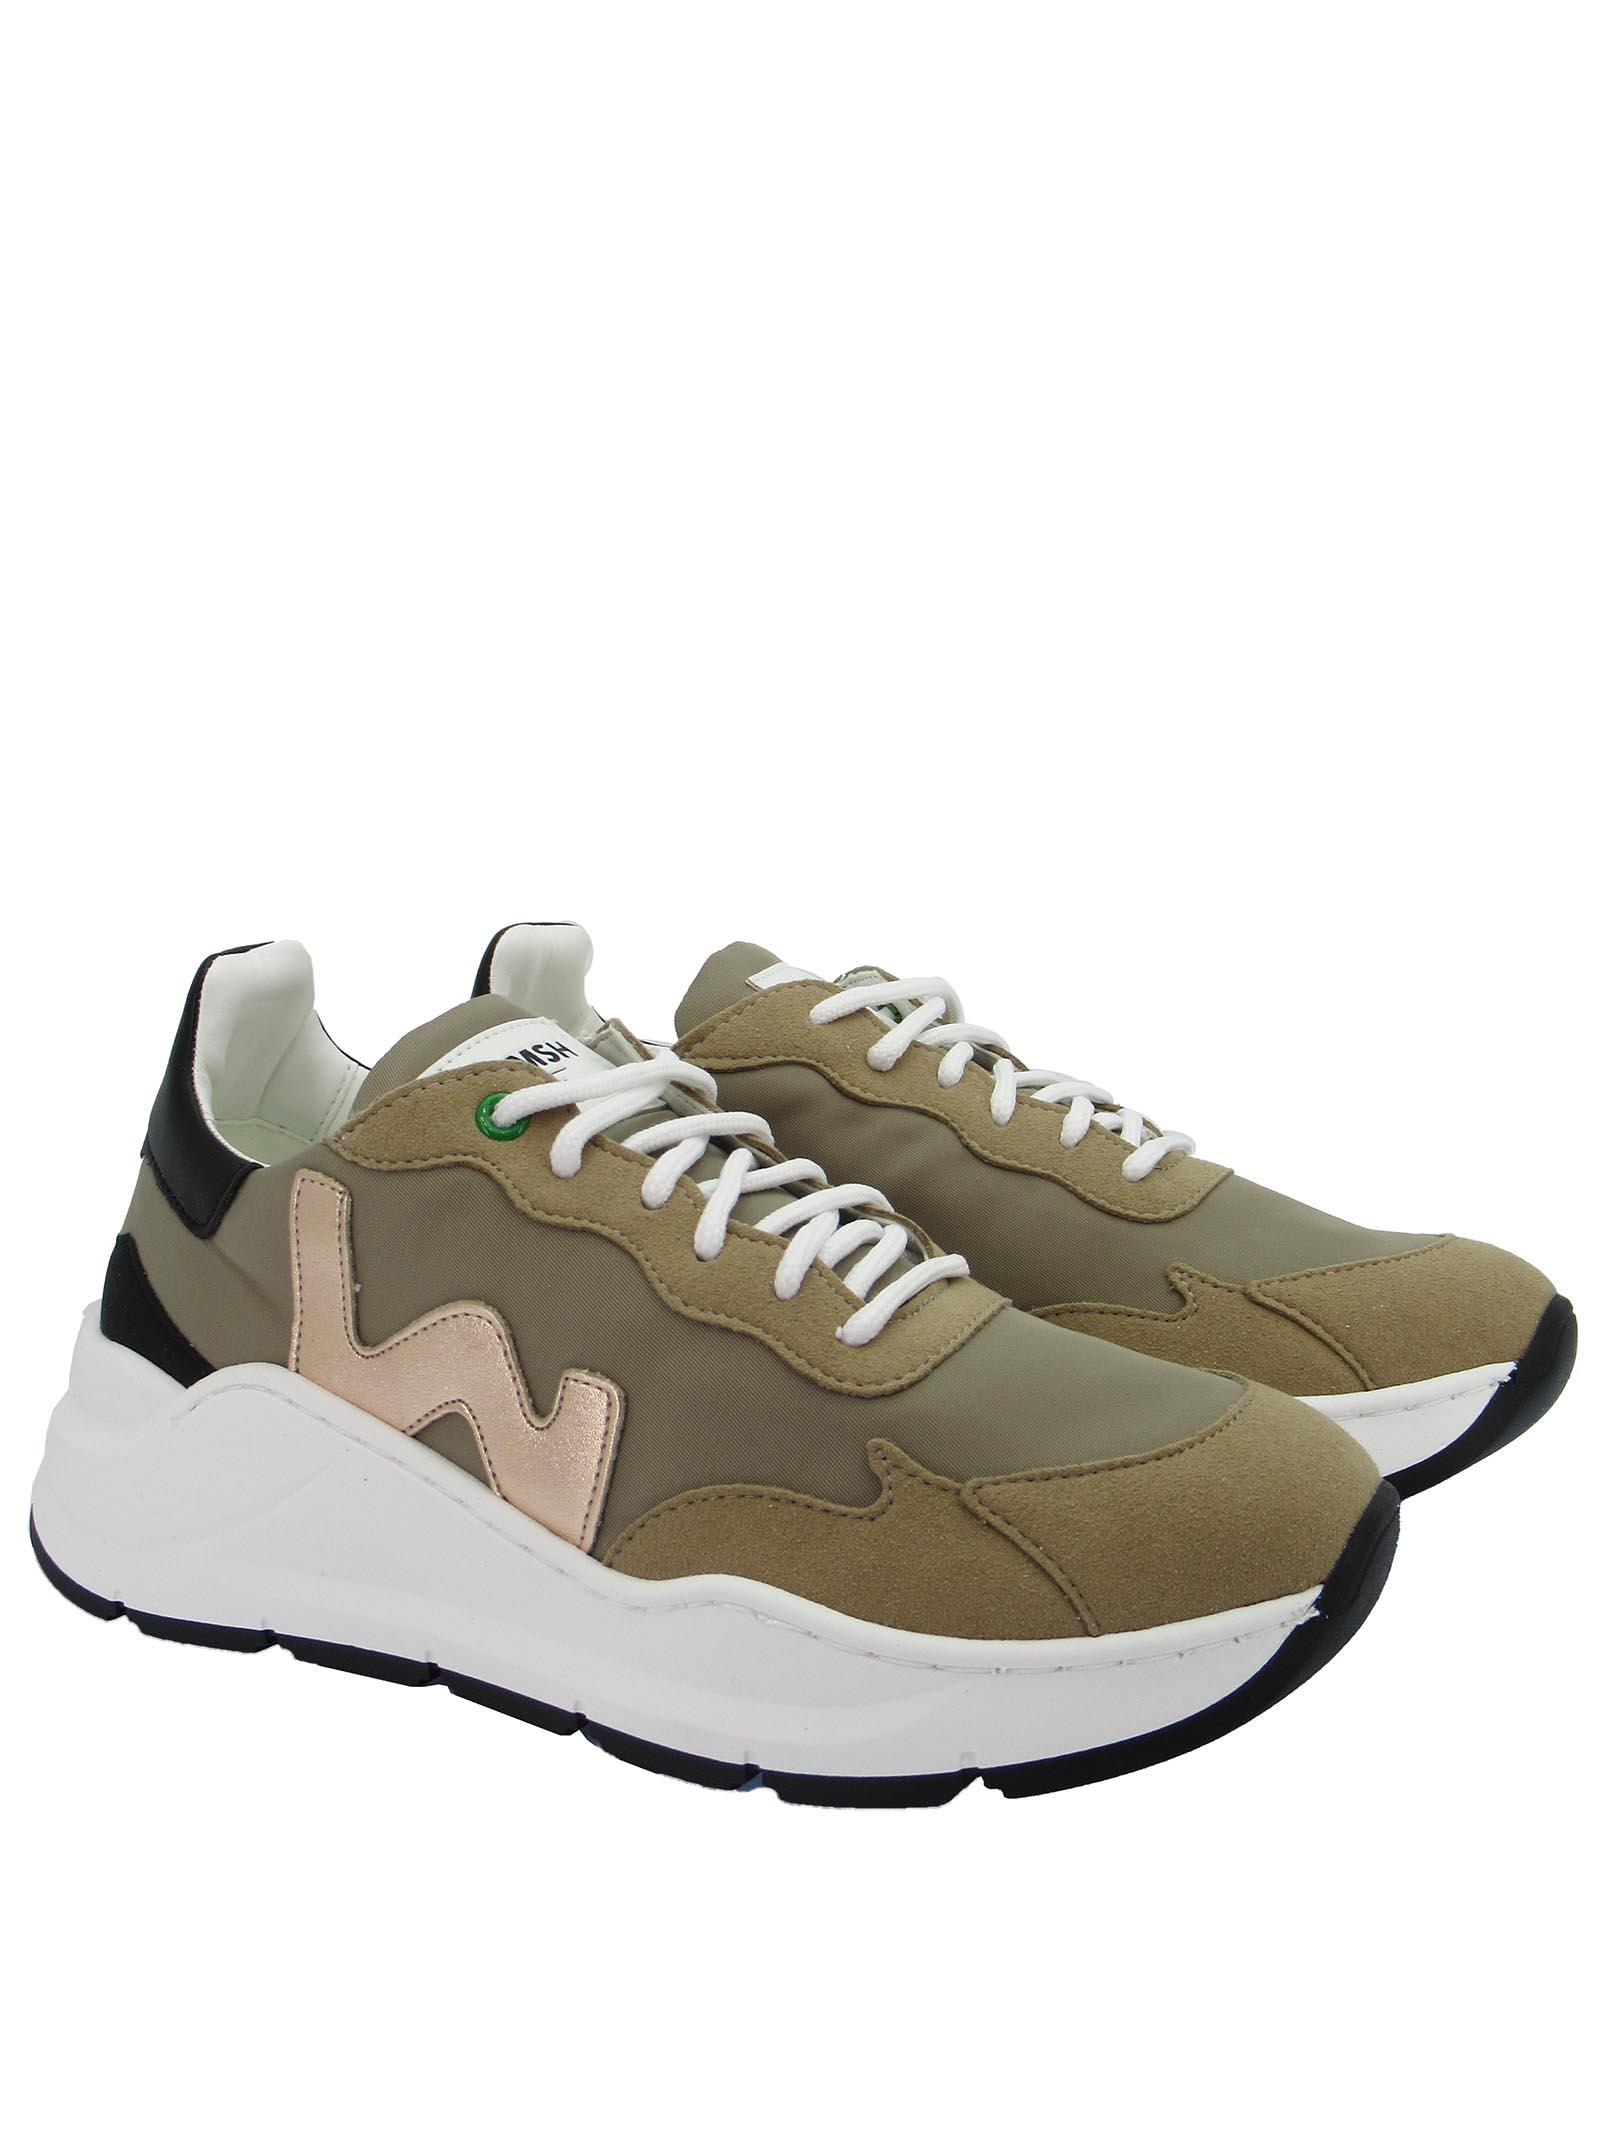 Calzature Donna Sneakers Stringate Vegan Wave in Nylon Beige Fondo Zeppa in Gomma Bianca Womsh   Sneakers   VEGAN WAVE004